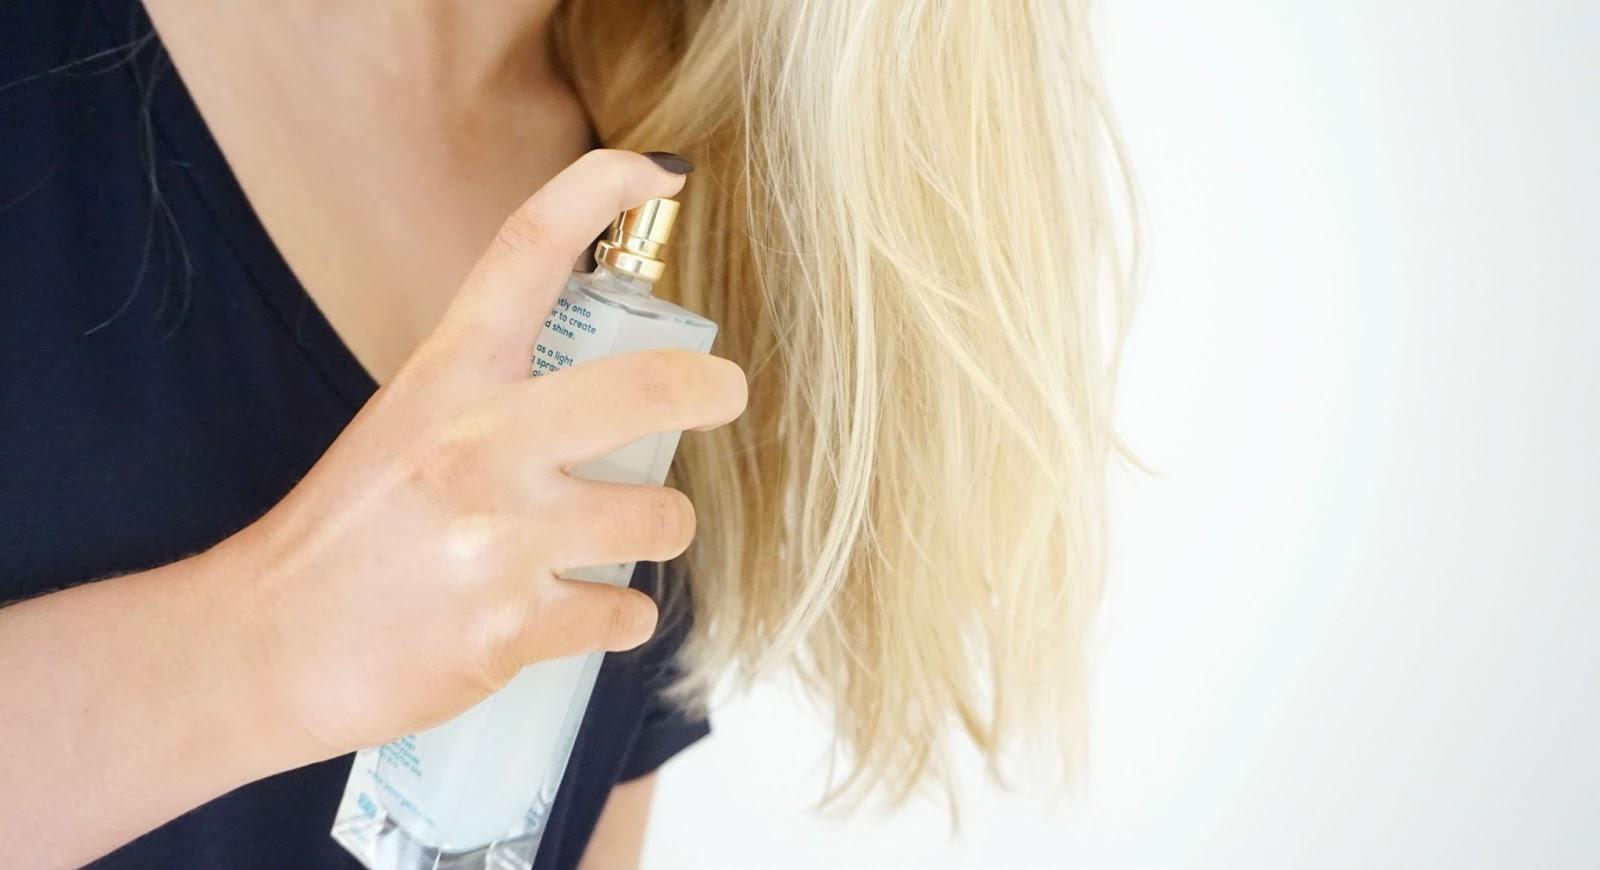 millionaire hair mist jkbargent natural organic hair treatment brand new product review harper bazaar